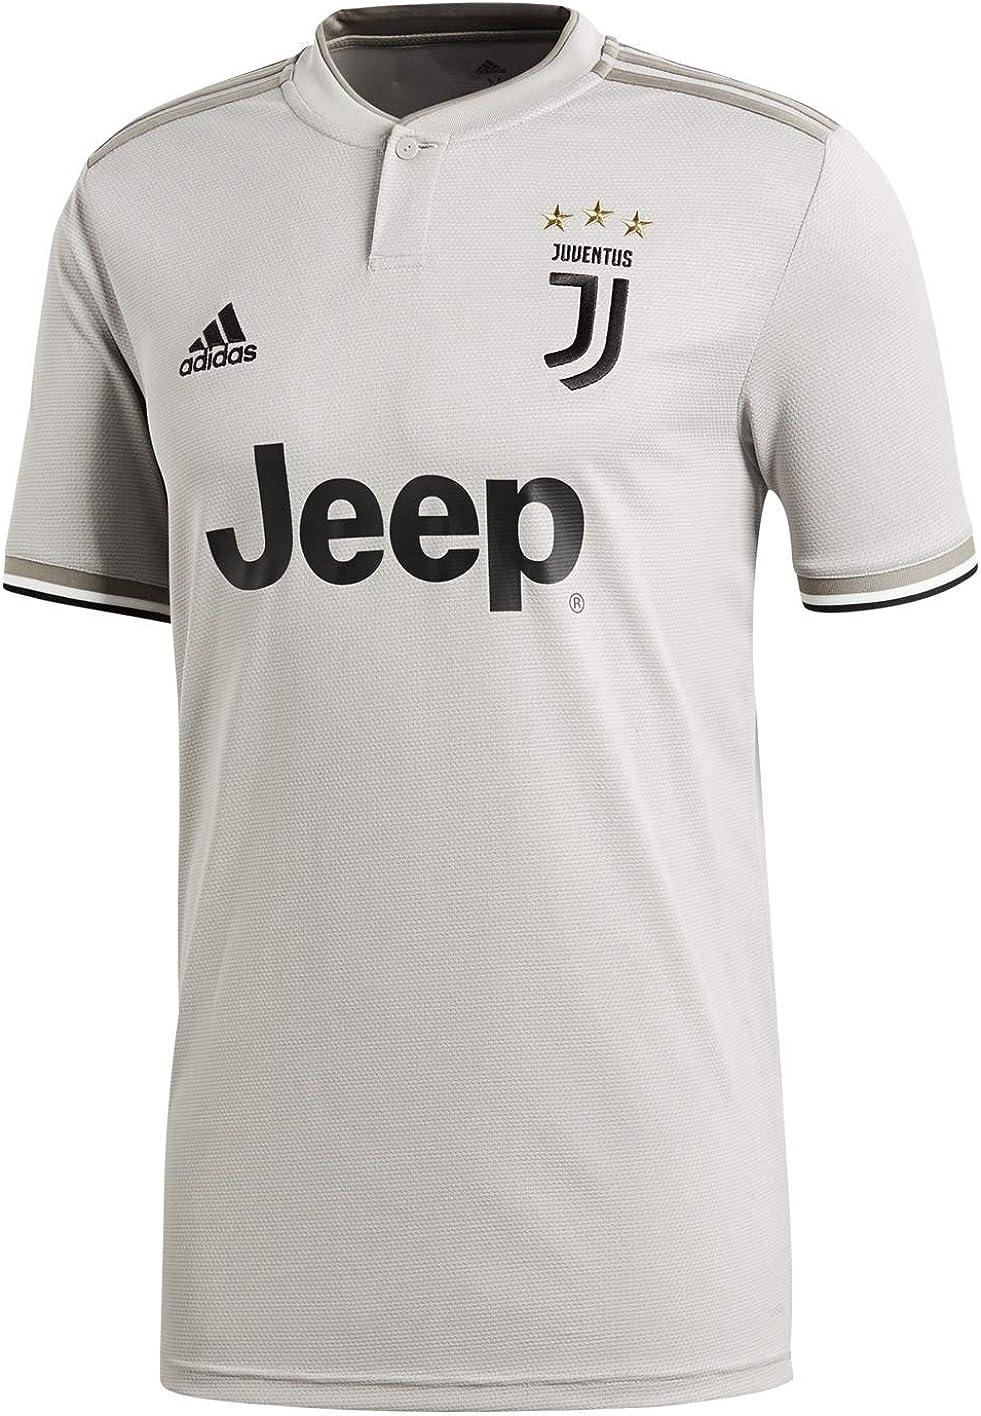 amazon com adidas juventus away youth soccer jersey 2018 19 clothing amazon com adidas juventus away youth